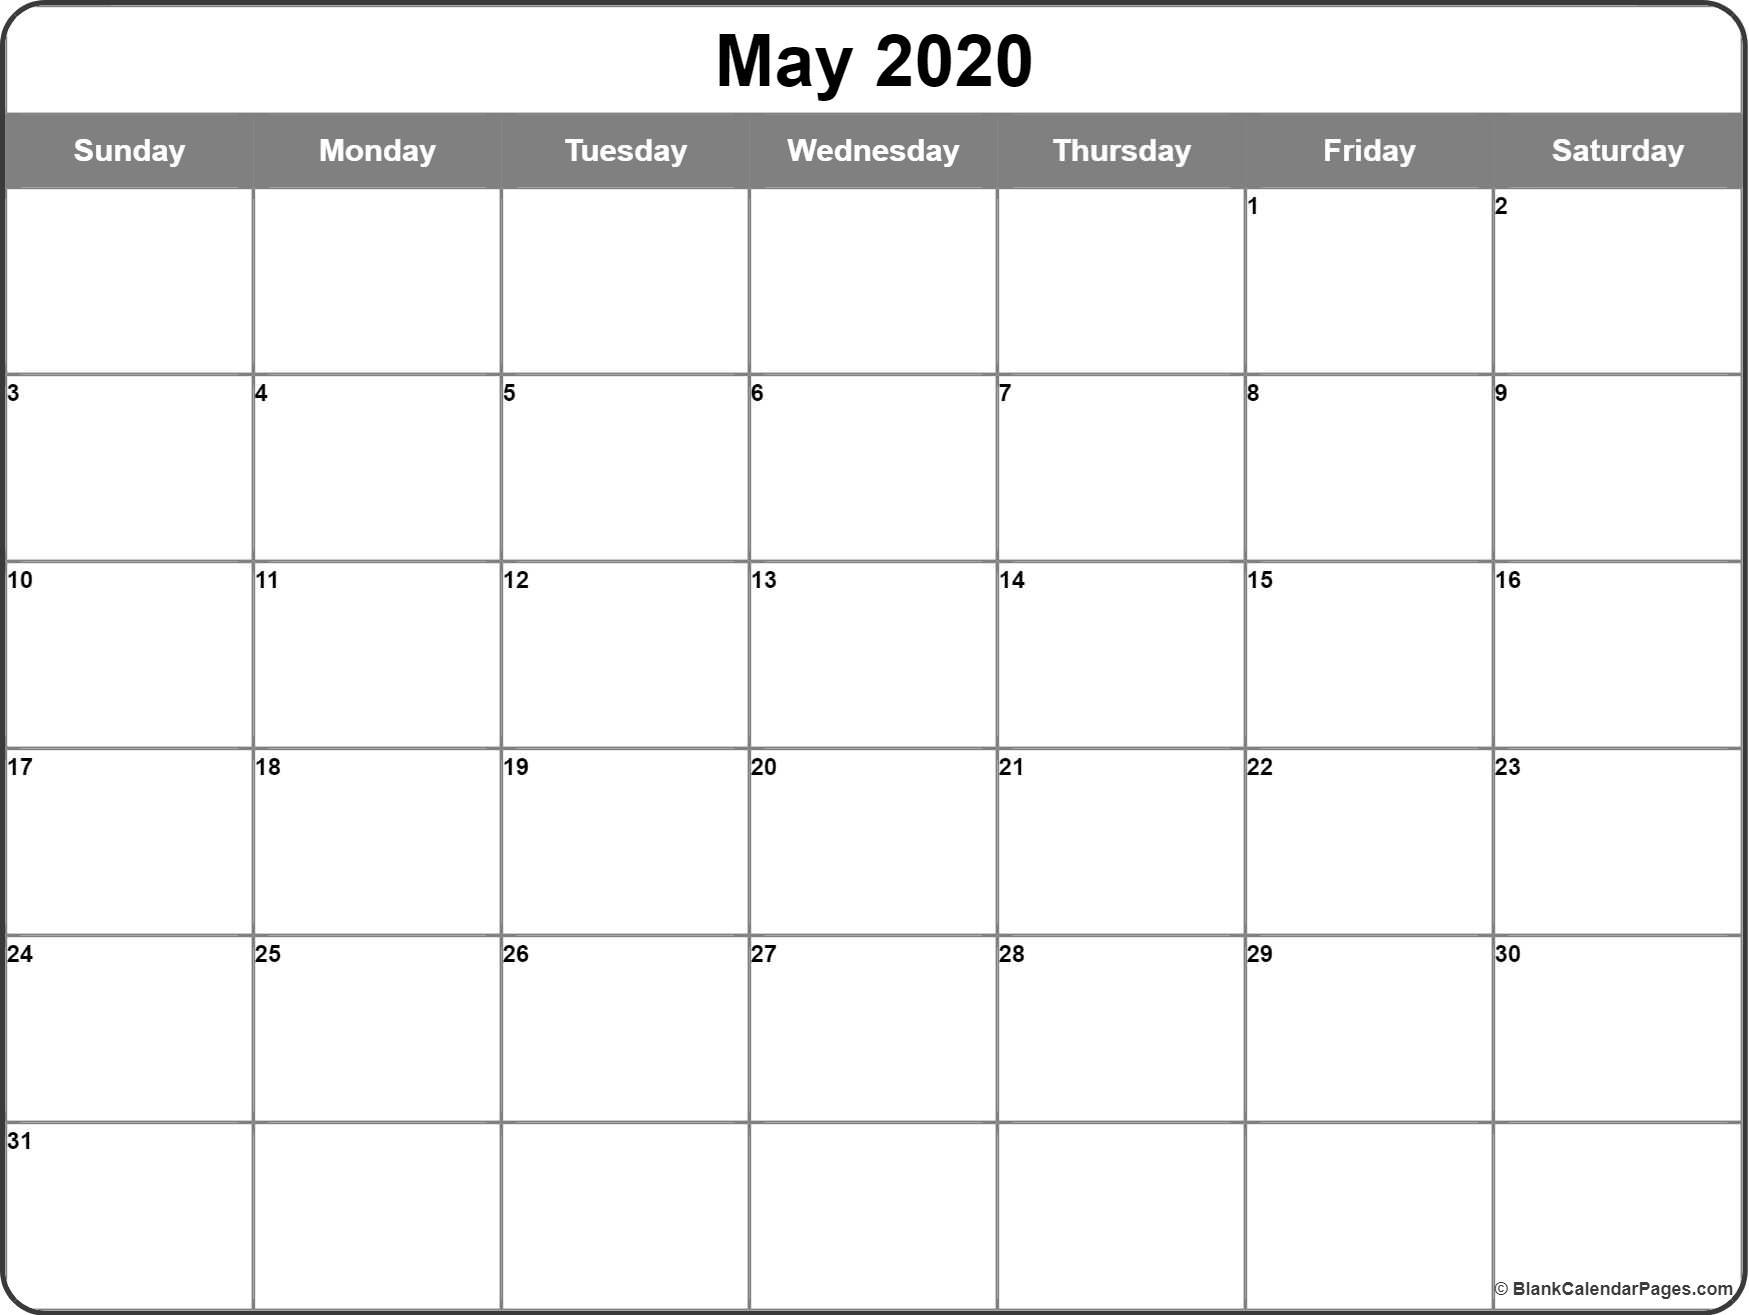 May 2020 Calendar | Free Printable Monthly Calendars with 2020 Calendar Free Printable With Space To Write